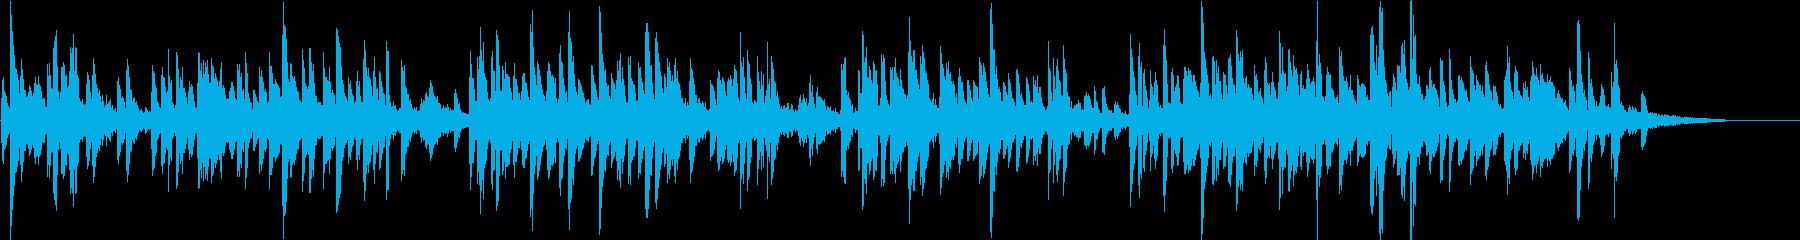 KANT近未来電子環境効果音の再生済みの波形